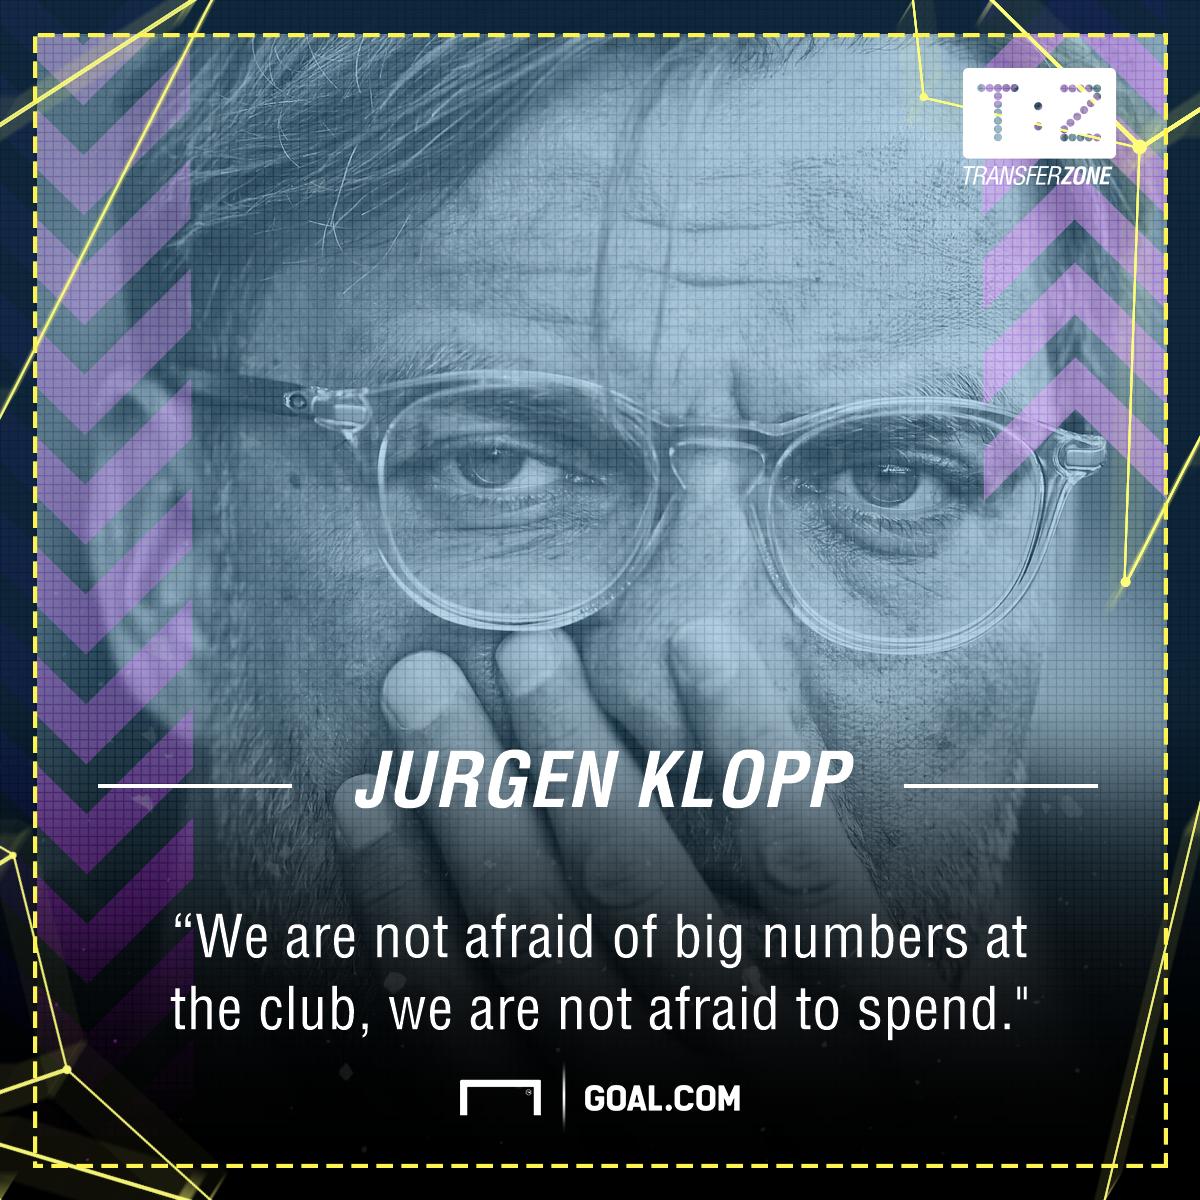 GFX Jurgen Klopp quote